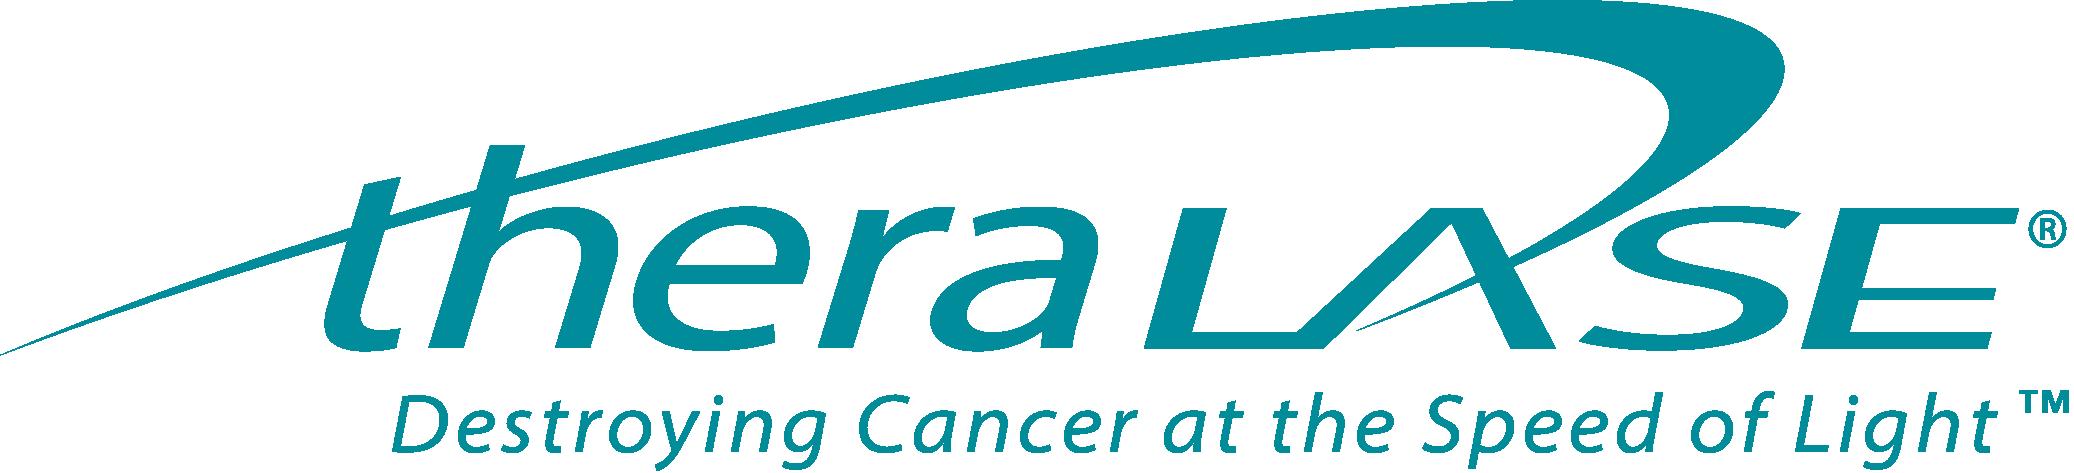 Theralase-logo-cancer-teal